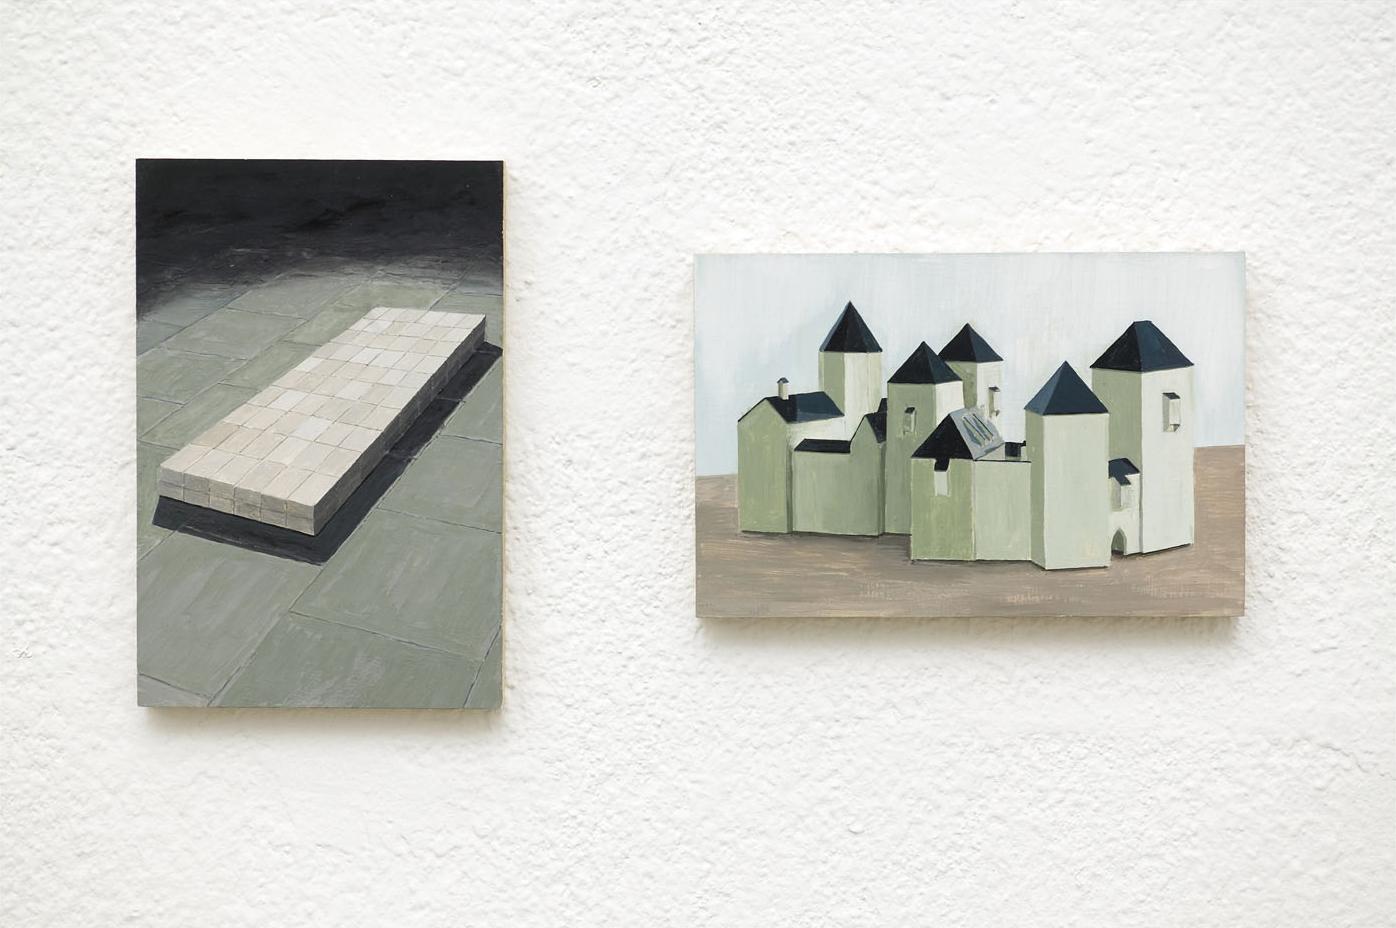 CARL + JULIAN Acrylic on Plywood 2 Panels Each 10 x 15 cm